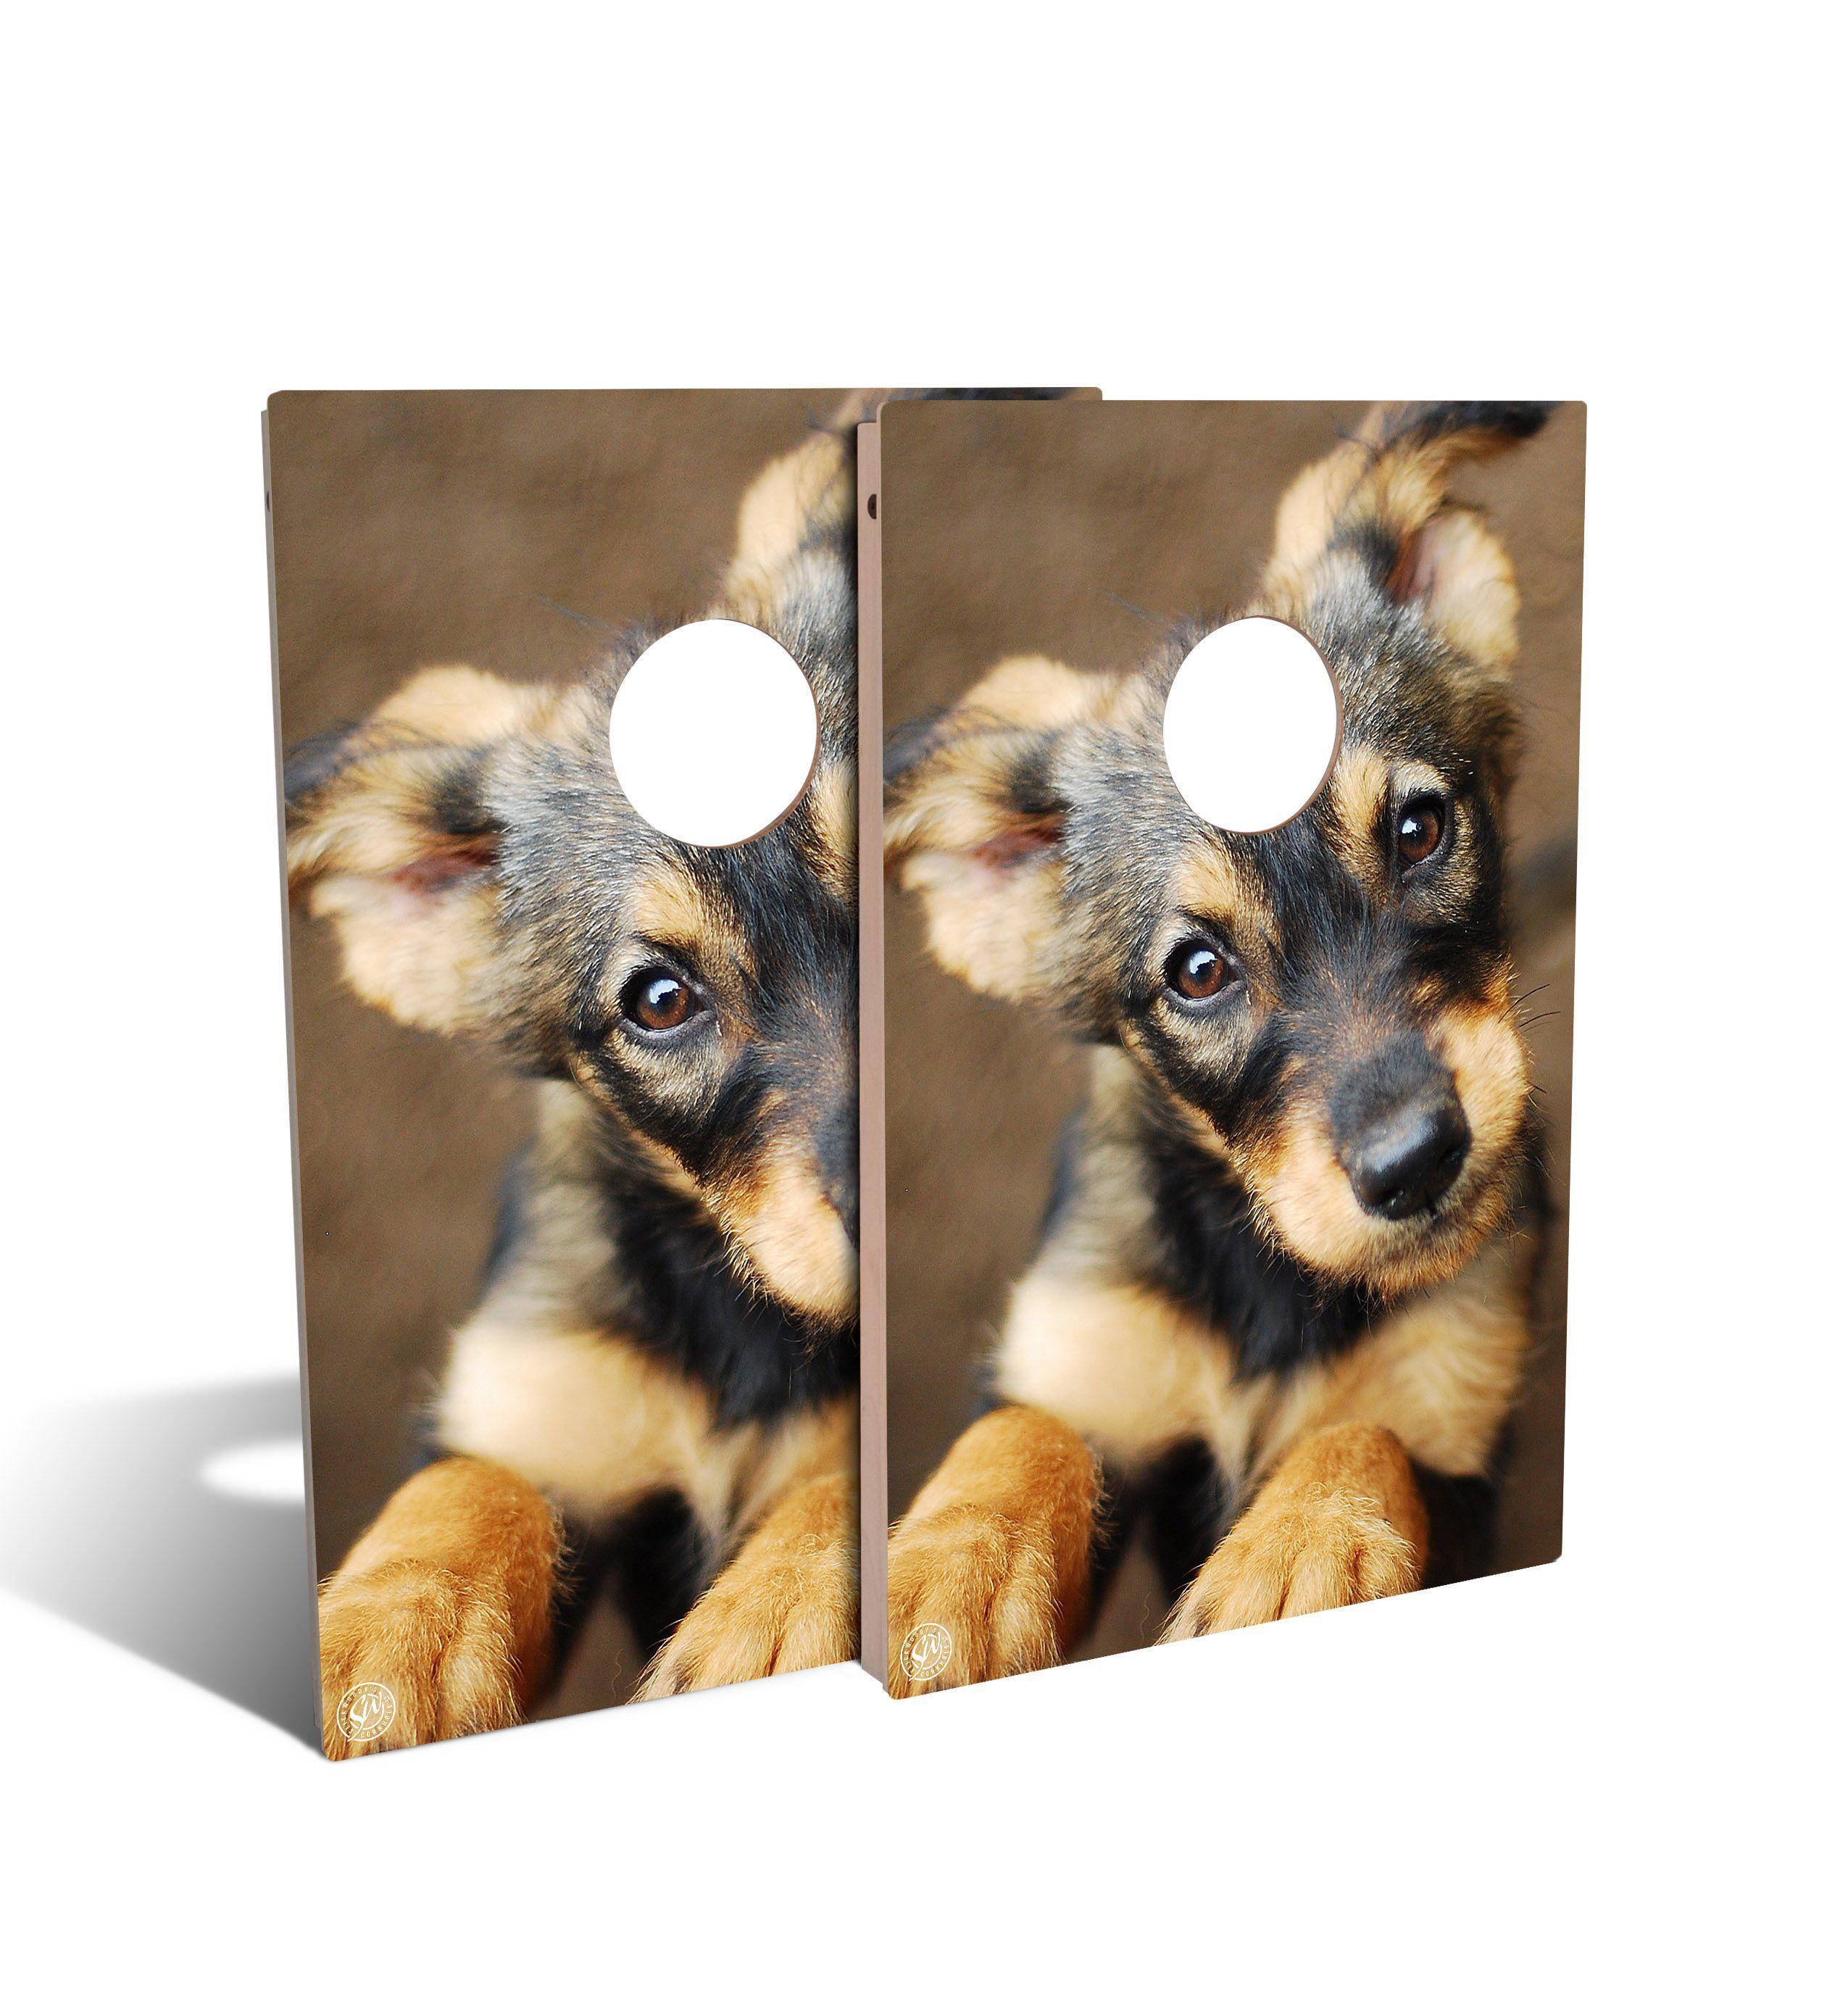 German Shepard Puppy Cornhole Set (includes 8 bags) #germanshepards German Shepard Puppy Cornhole Set (includes 8 bags) #germanshepards